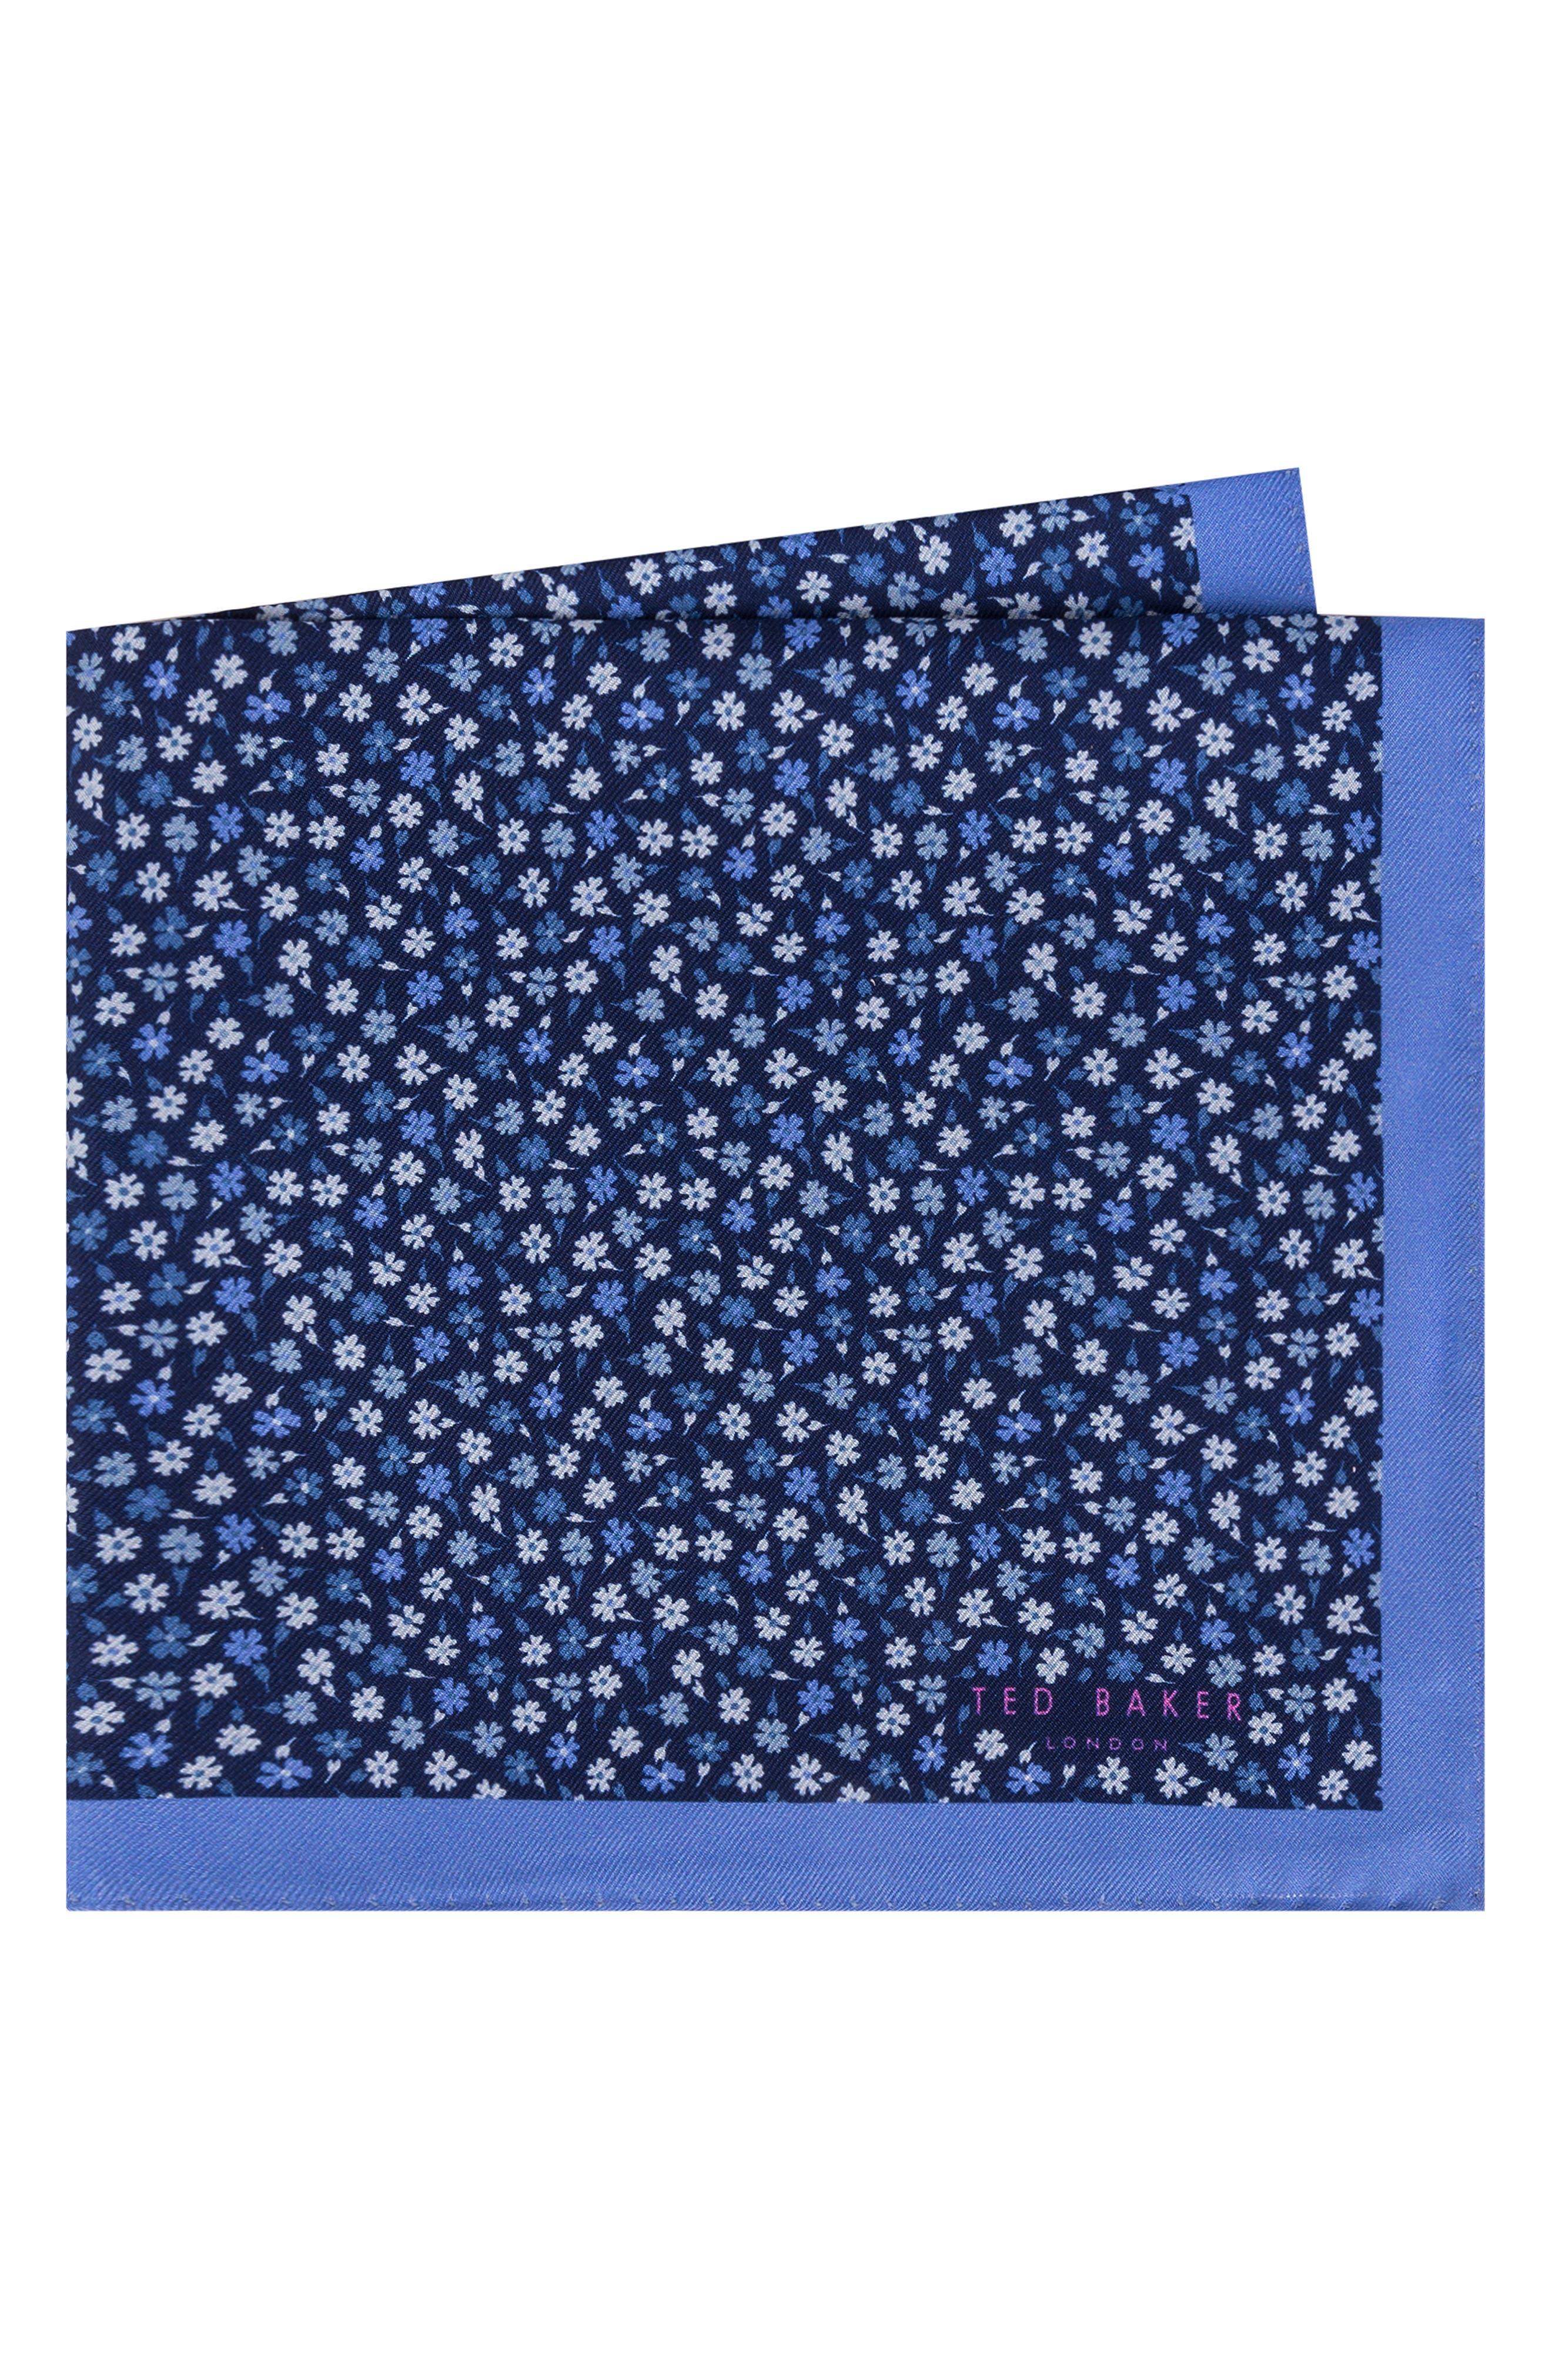 TED BAKER LONDON Floral Silk Pocket Square, Main, color, 455